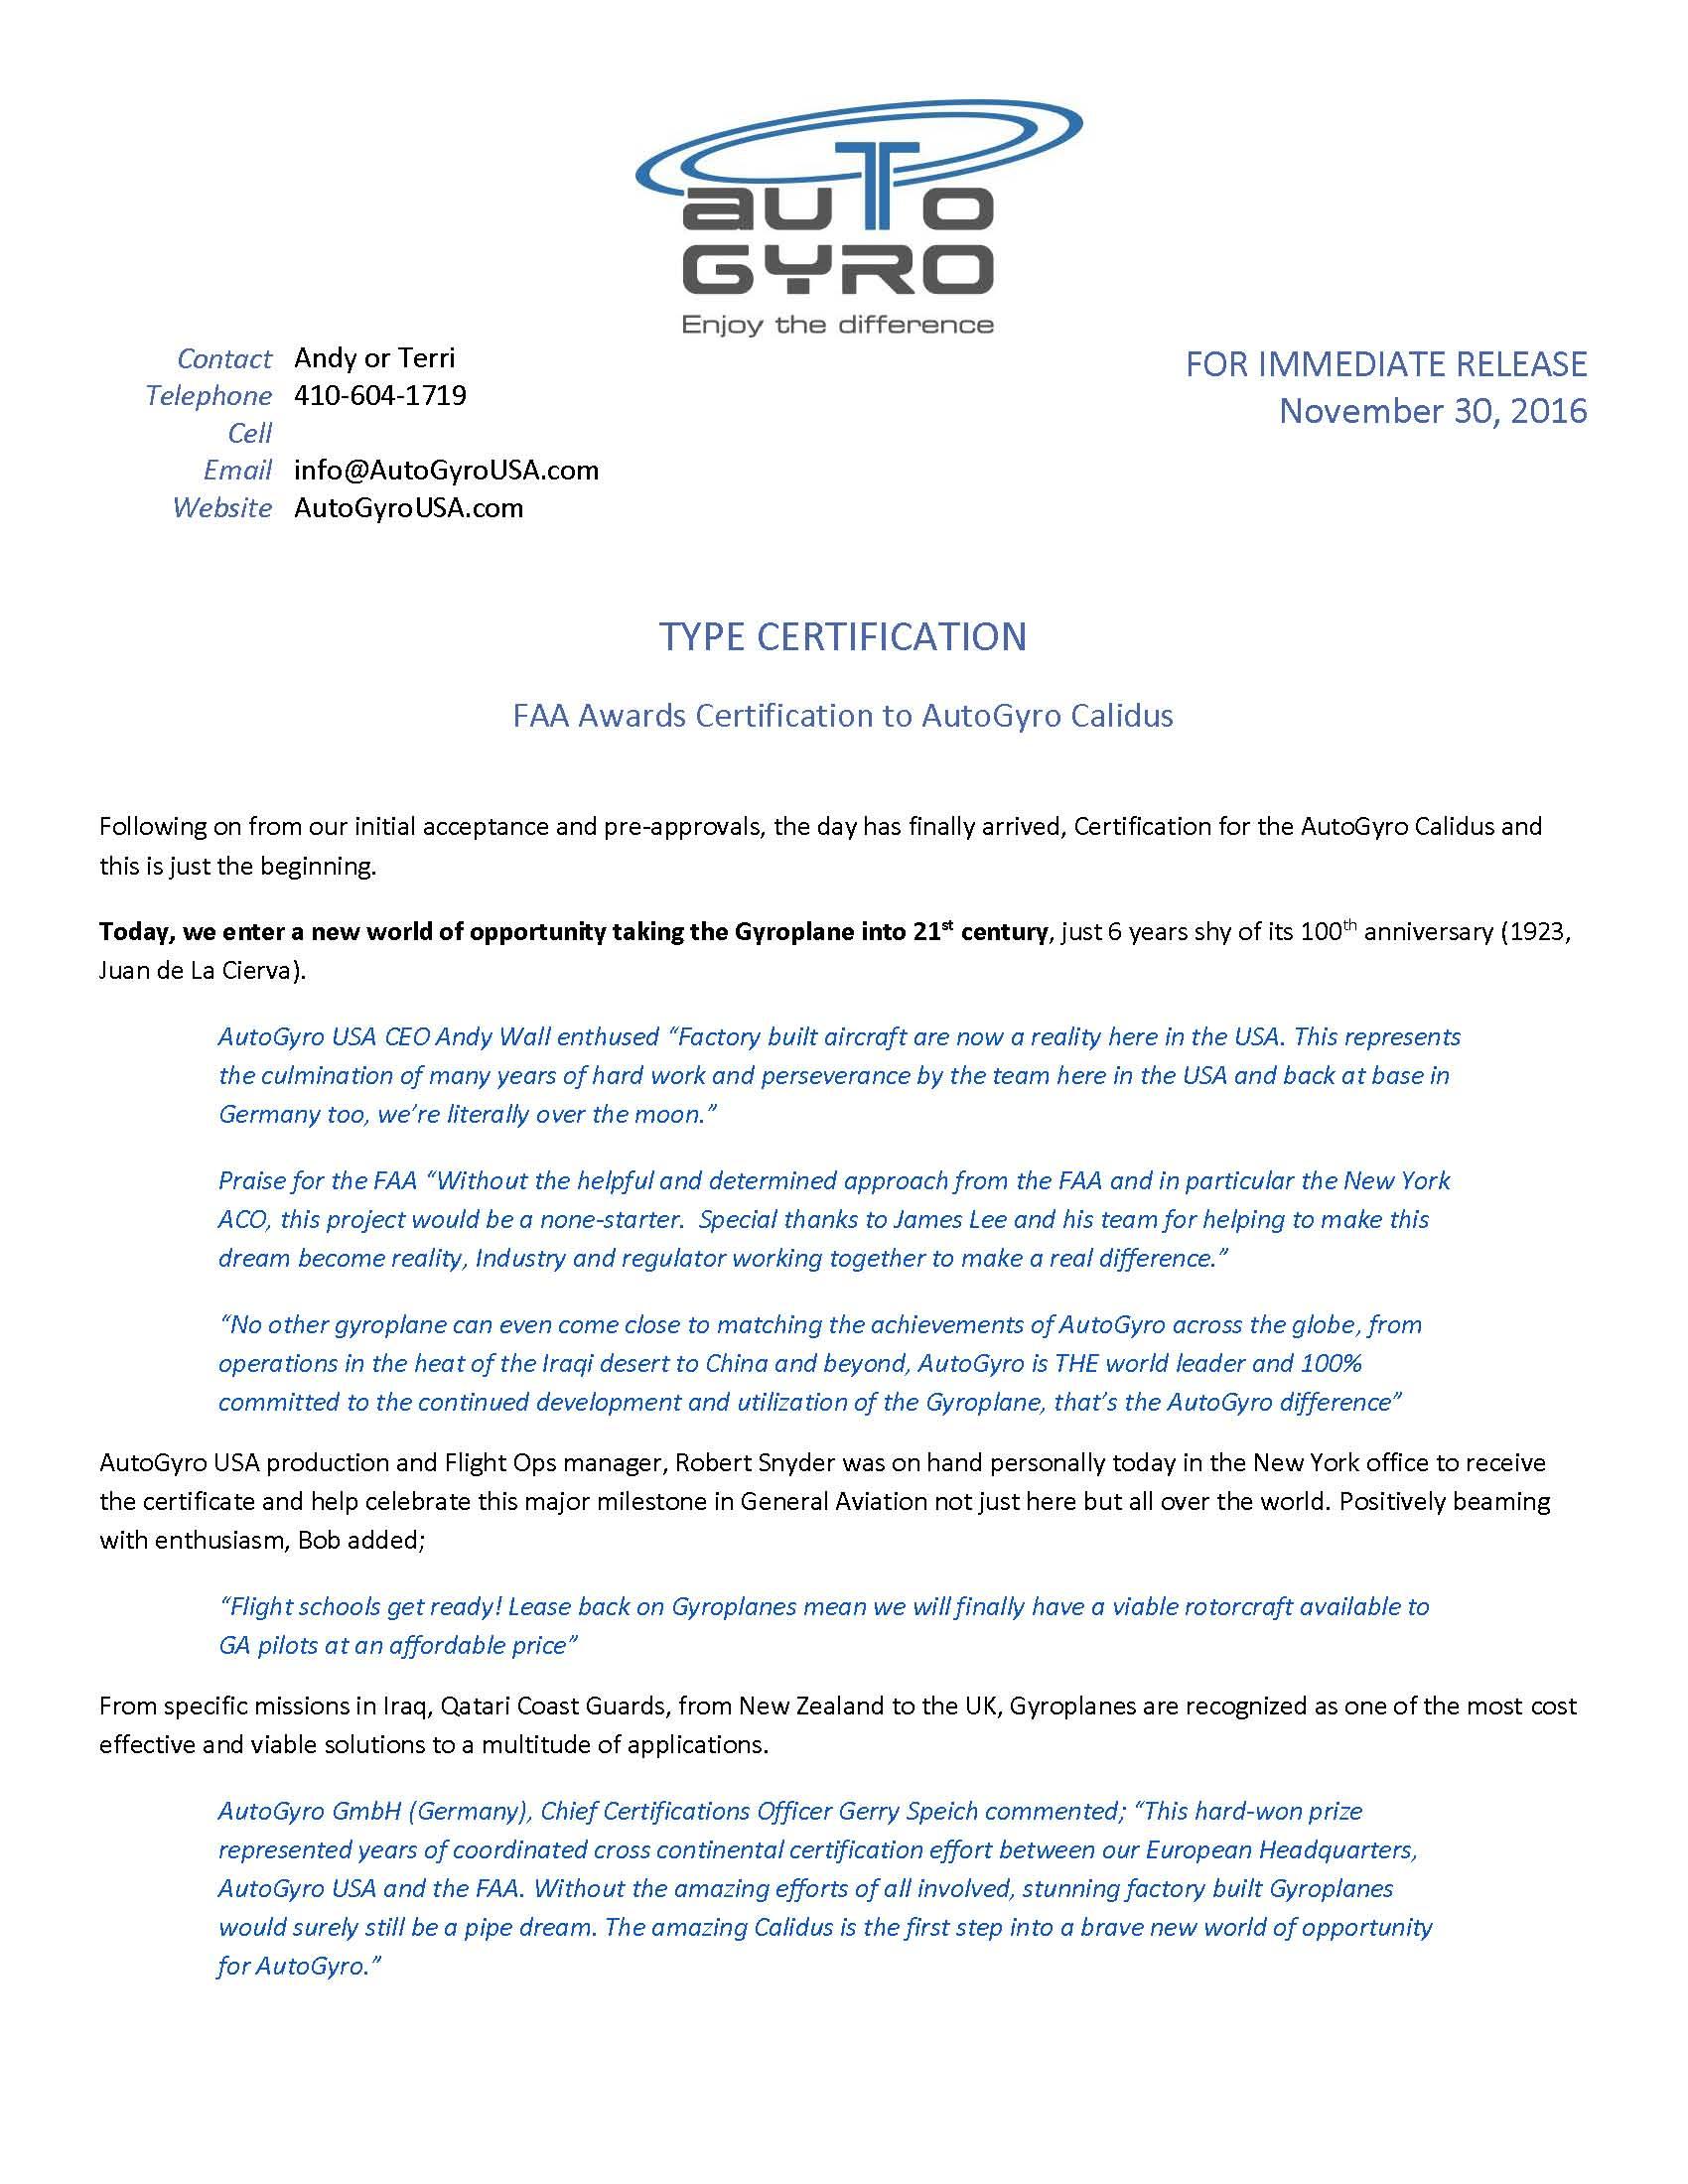 Calidus Type Certificate PR 2 1130 PC_Page_1.jpg